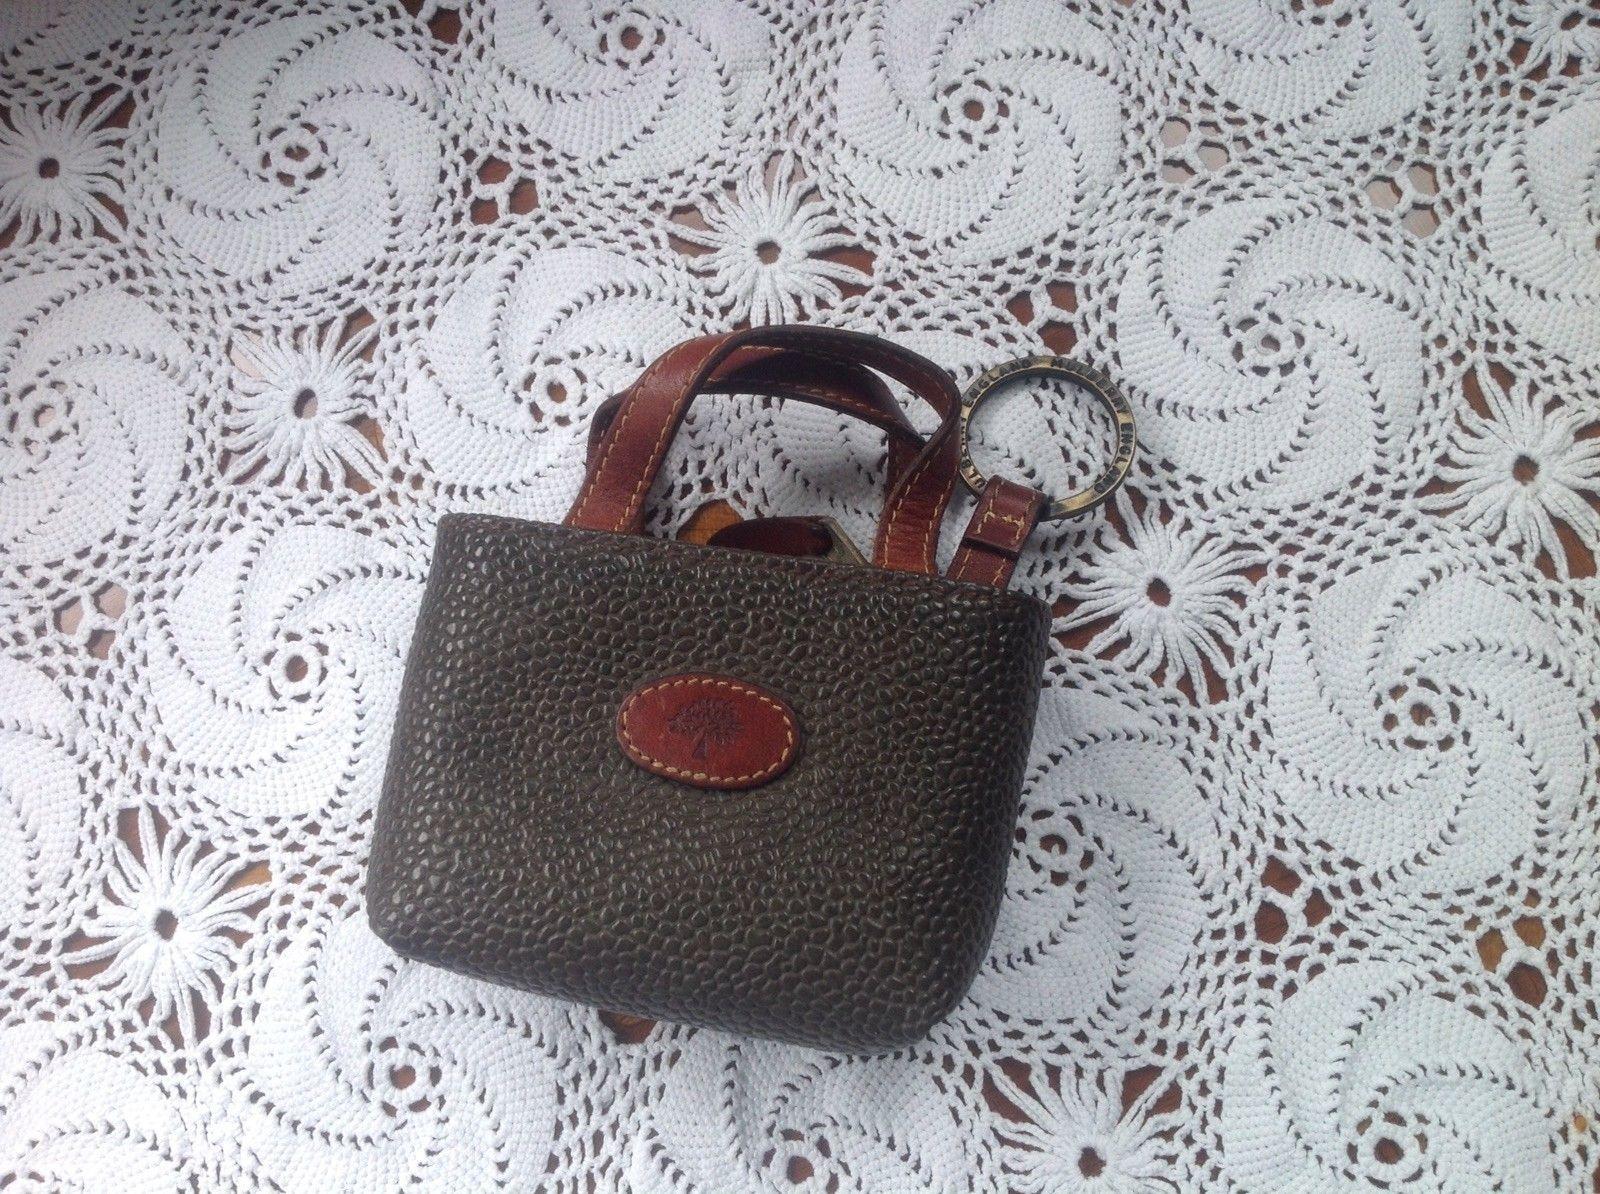 e7176bd1472 Mulberry Bag Charm/ Keyring i 2018 | Mulberry | Pinterest | Mulberry ...